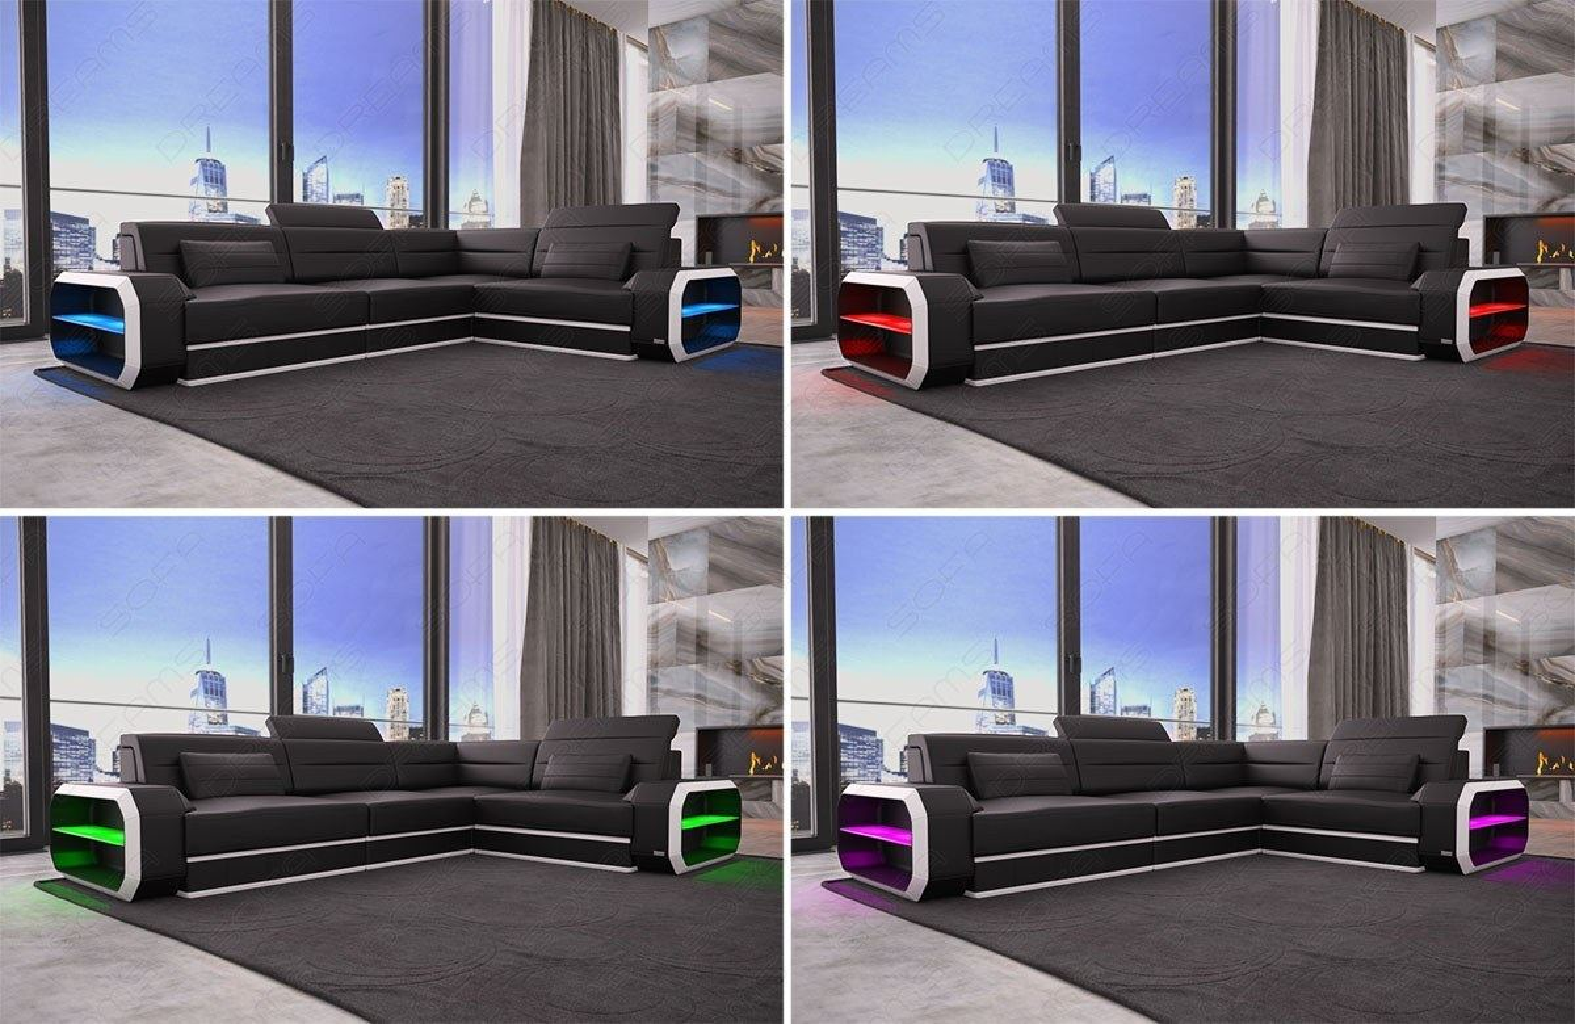 echtledercouch designersofa verona l form ottomane led. Black Bedroom Furniture Sets. Home Design Ideas